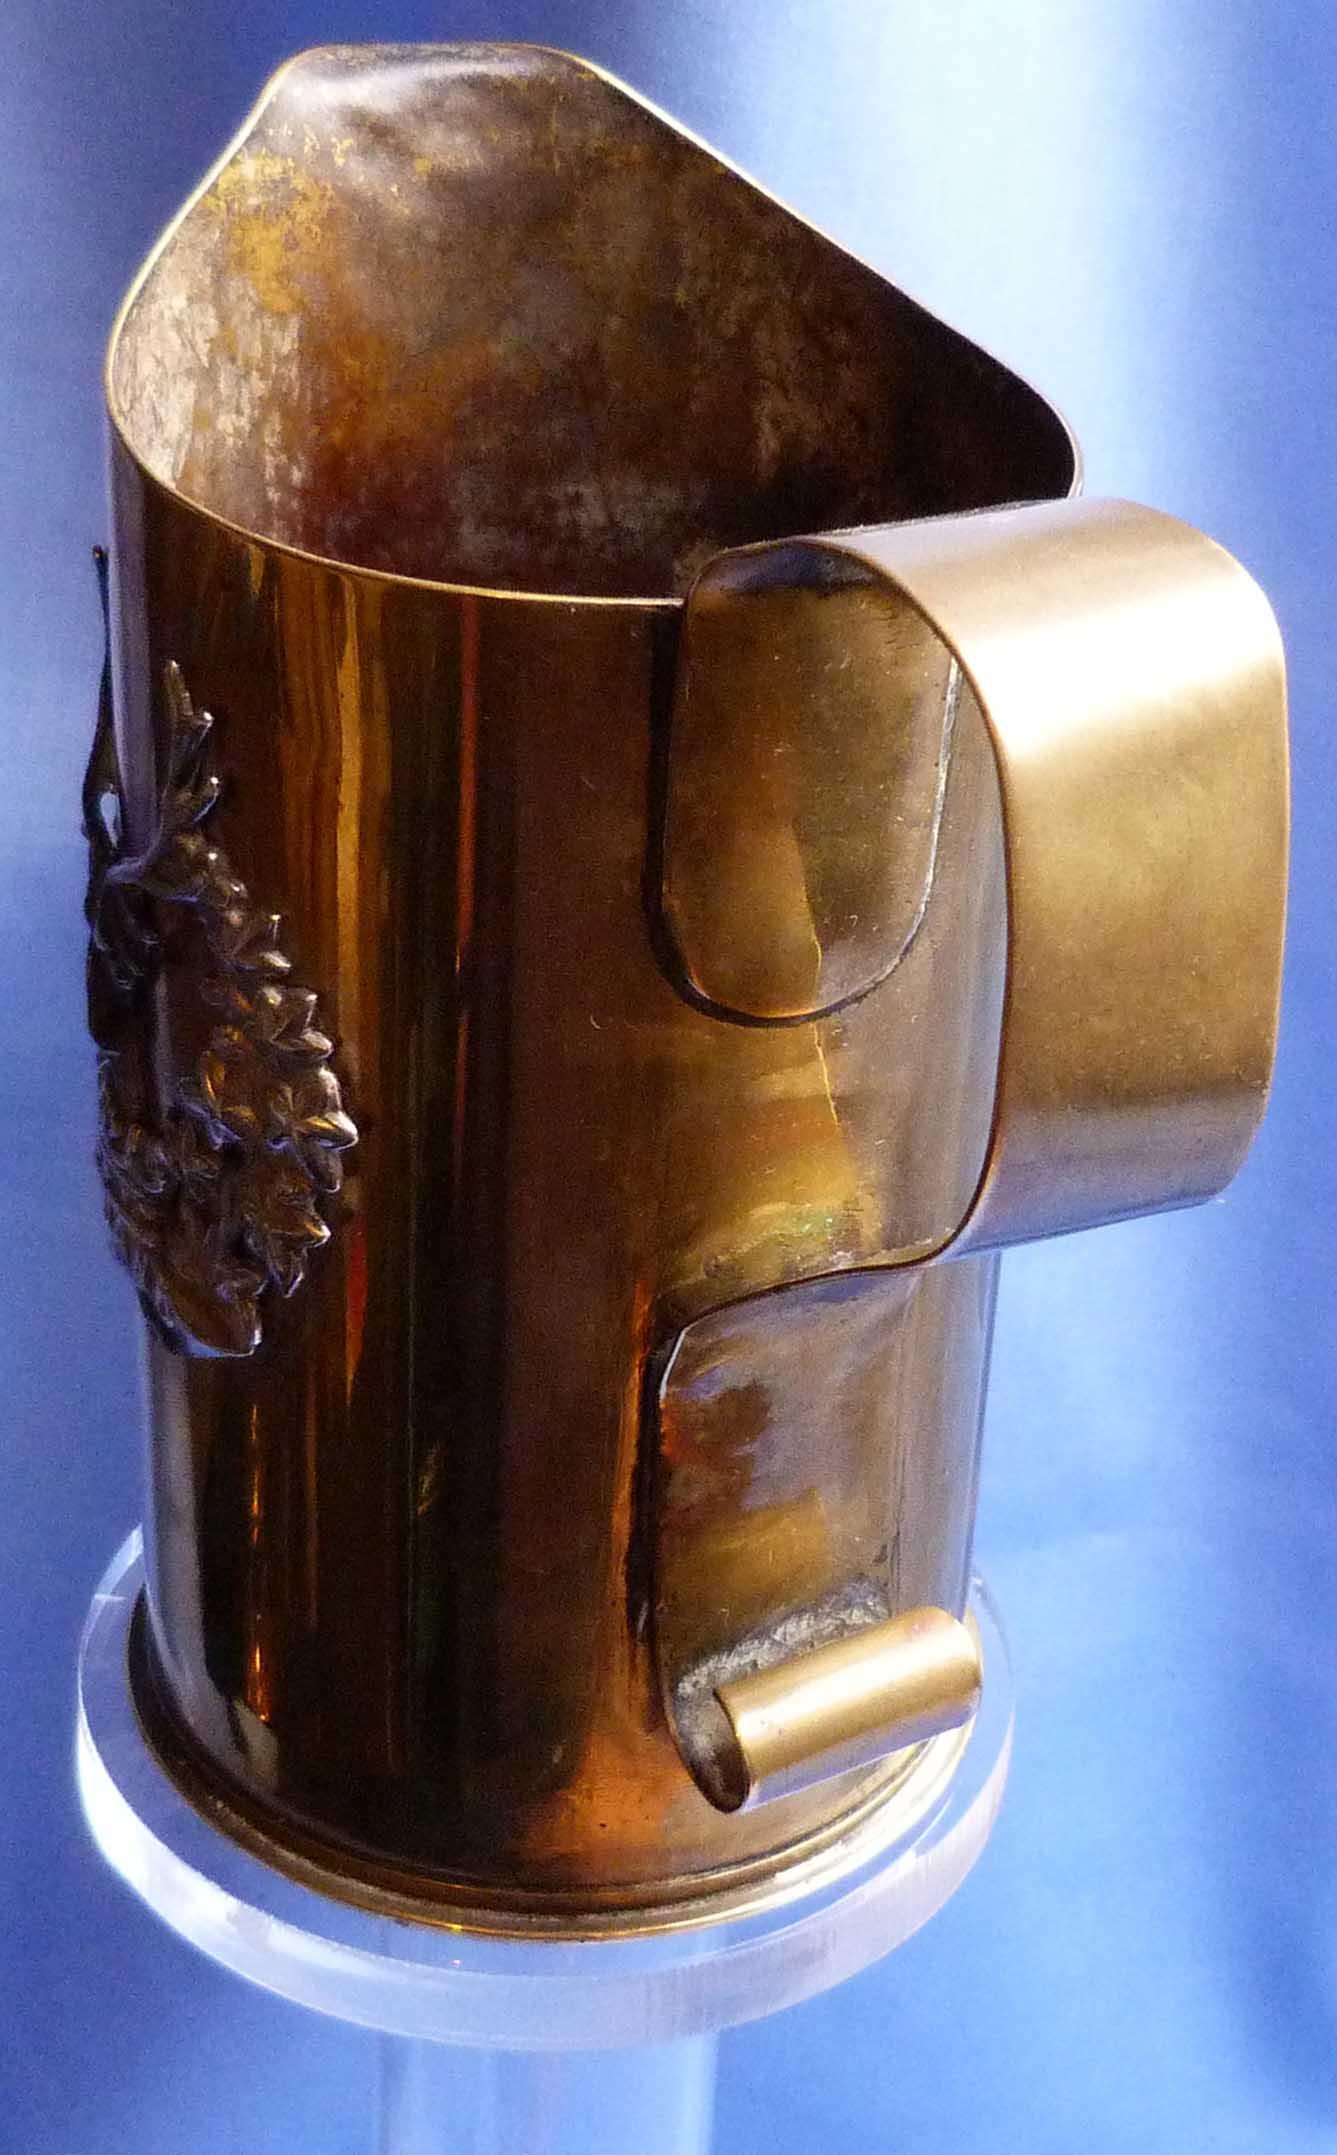 scottish-ww1-trench-lamp-4